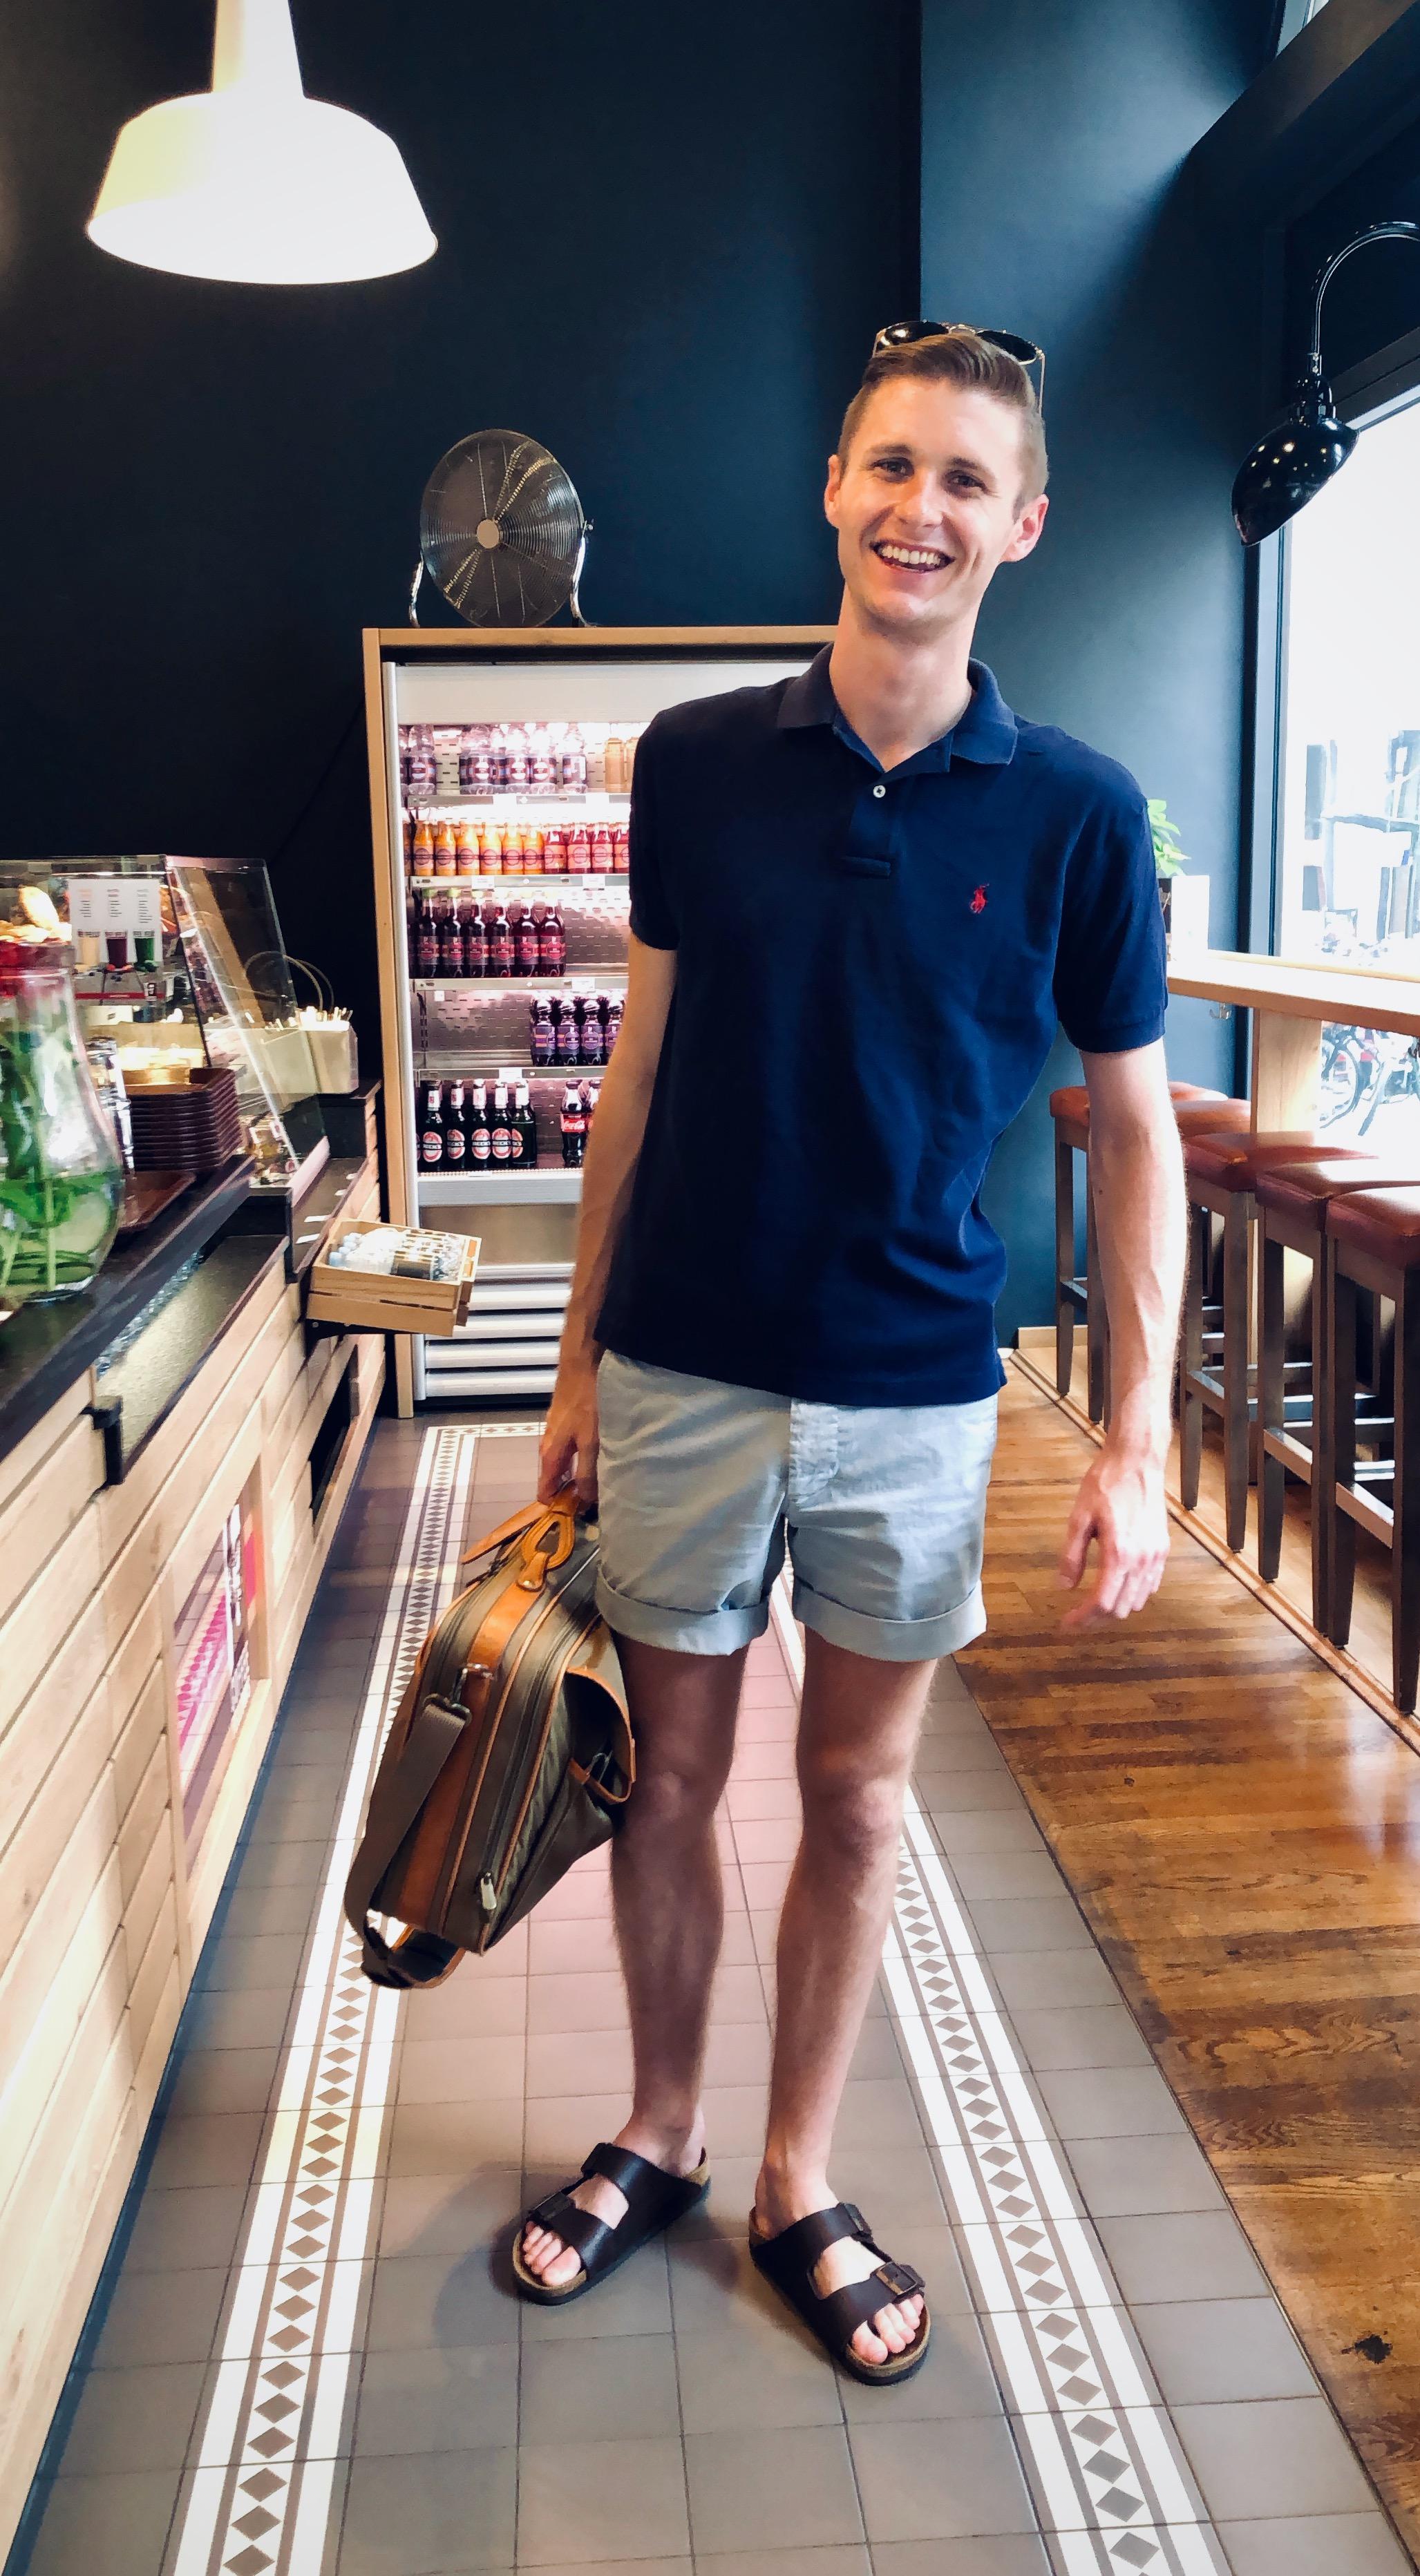 Evan Currie enjoys a bakery in Naumburg, Germany.